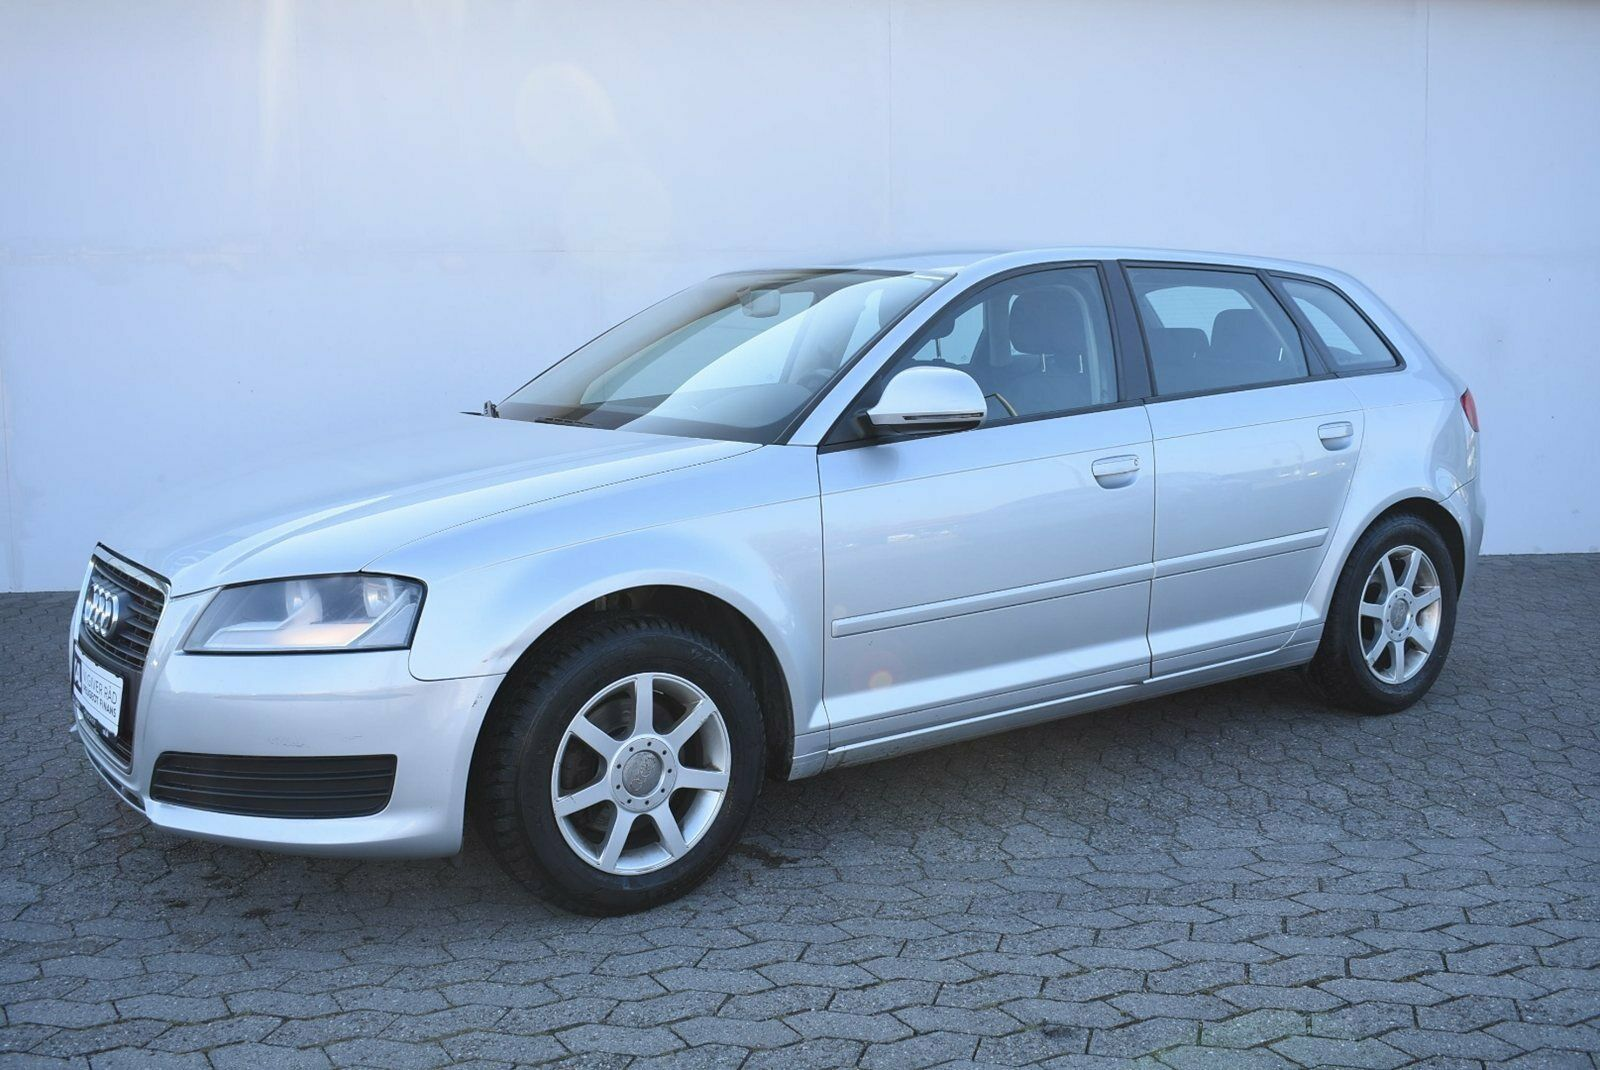 Audi A3 2,0 TDi 140 Ambiente SB 5d - 74.900 kr.